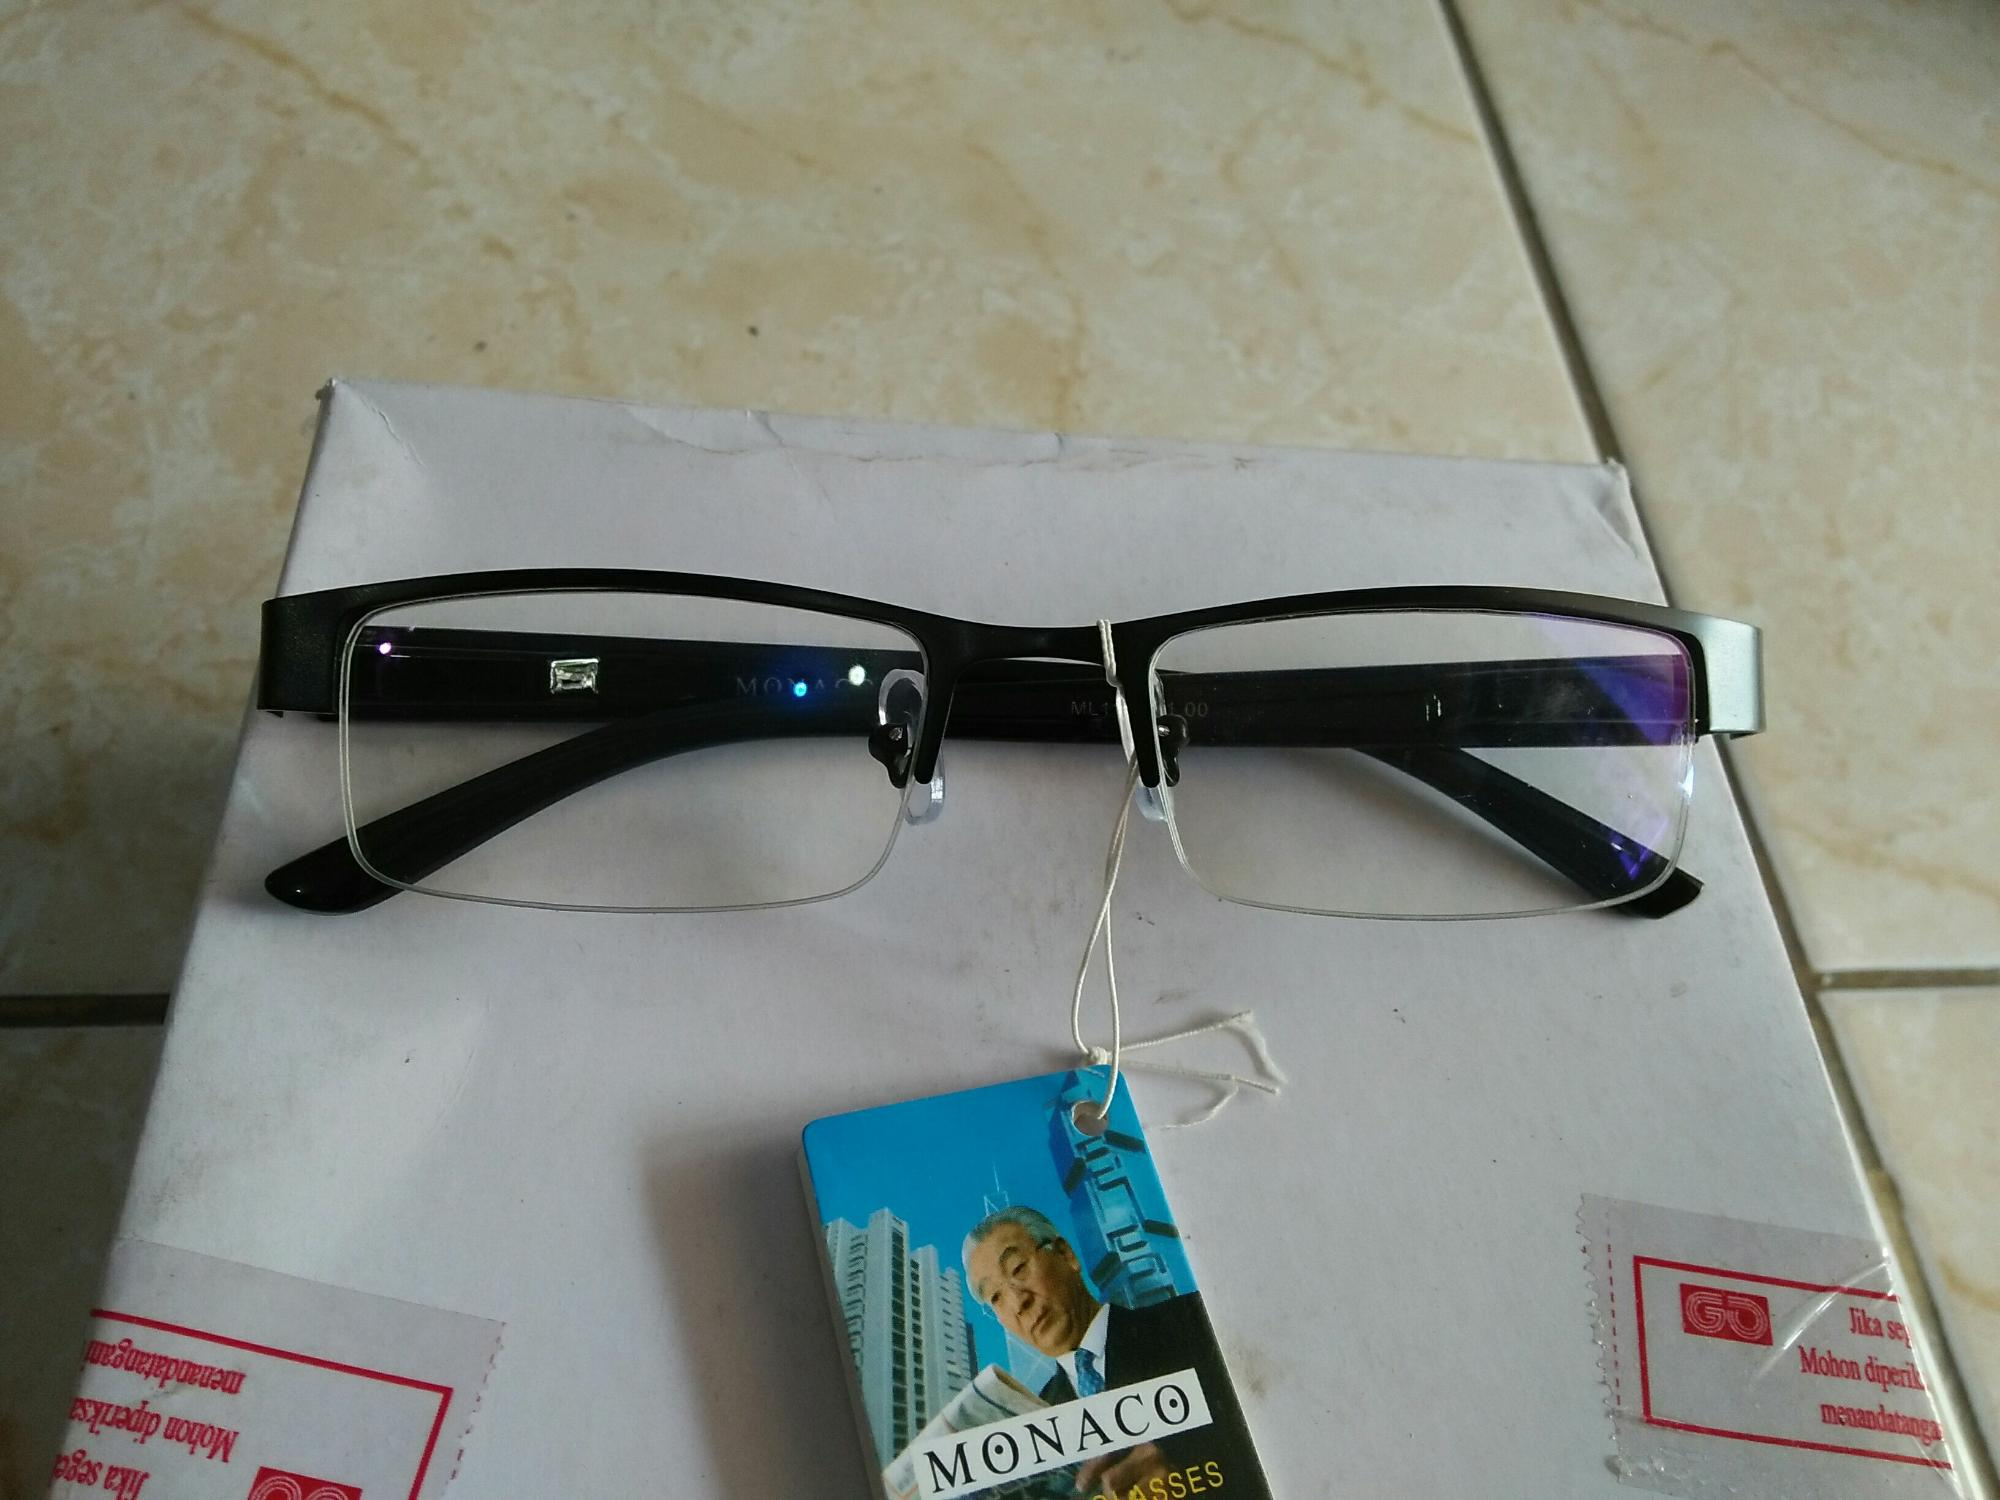 Promo kacamata plus 1.00 murah persegi anti radiasi handphone dan komputer ML112